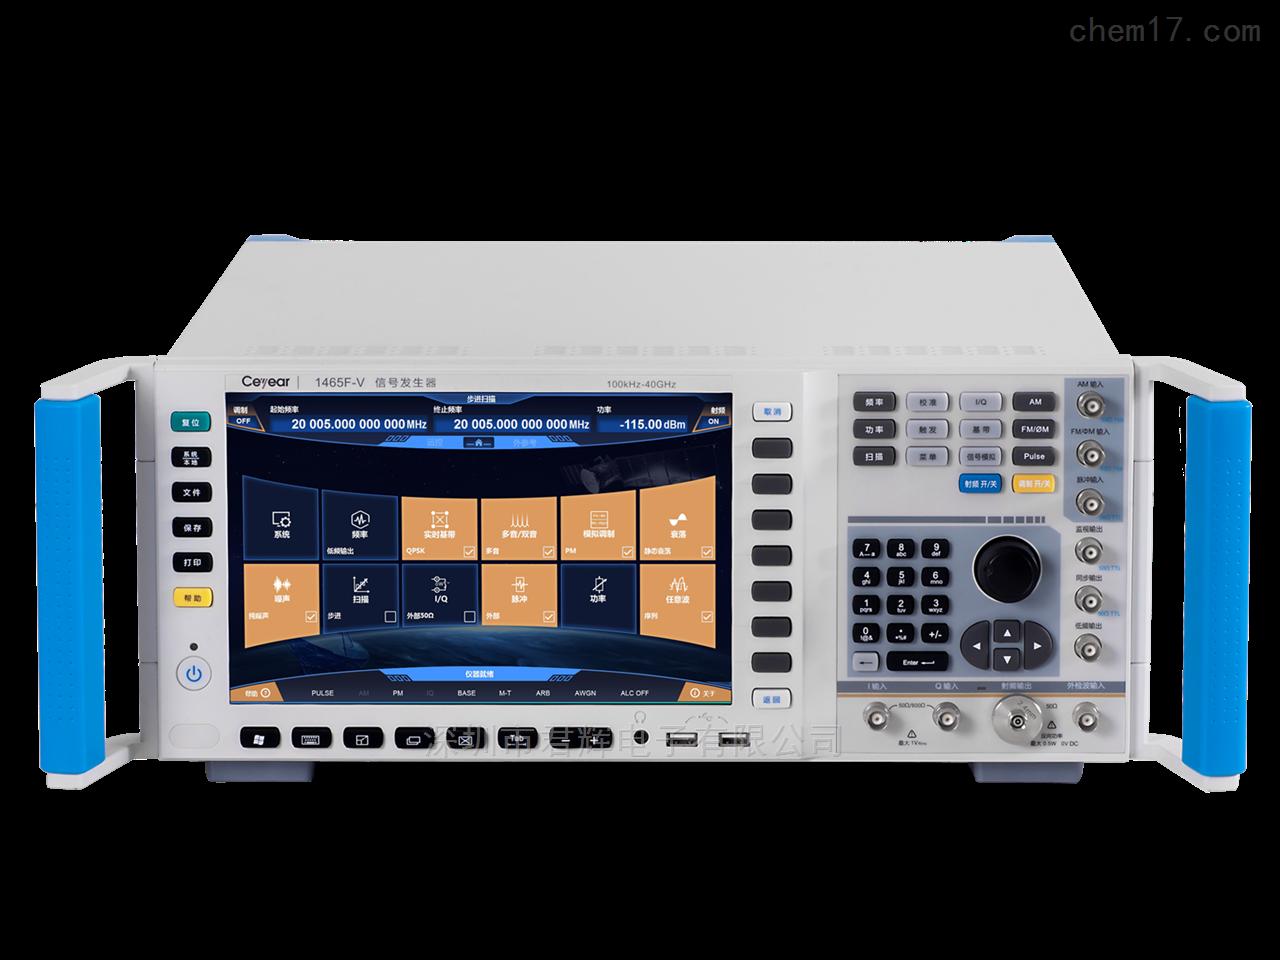 ceyear思仪1465A/B/C/D/F/H/L-V信号发生器